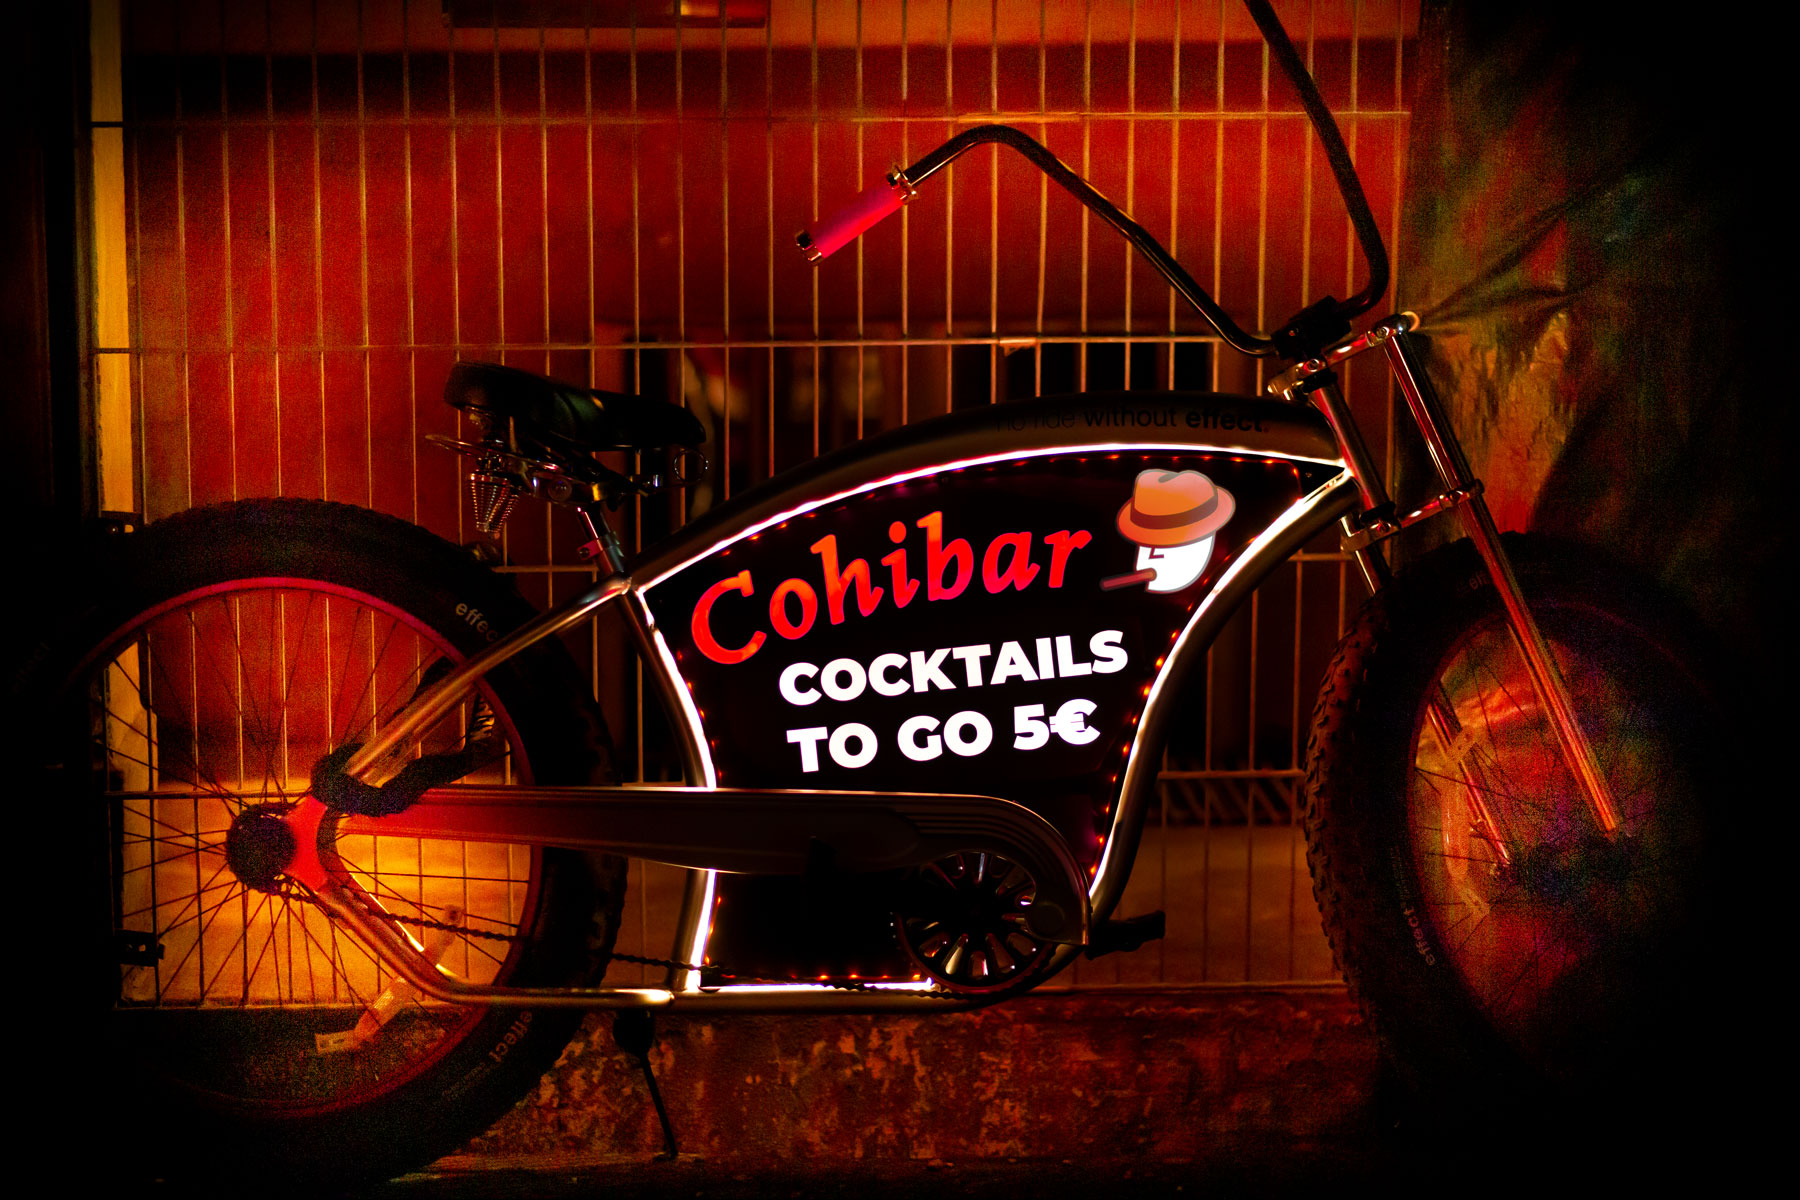 CohiBike-LitBike-LED-Fahrrad-Werberad-Werbefahrrad-ohne-logo.jpg